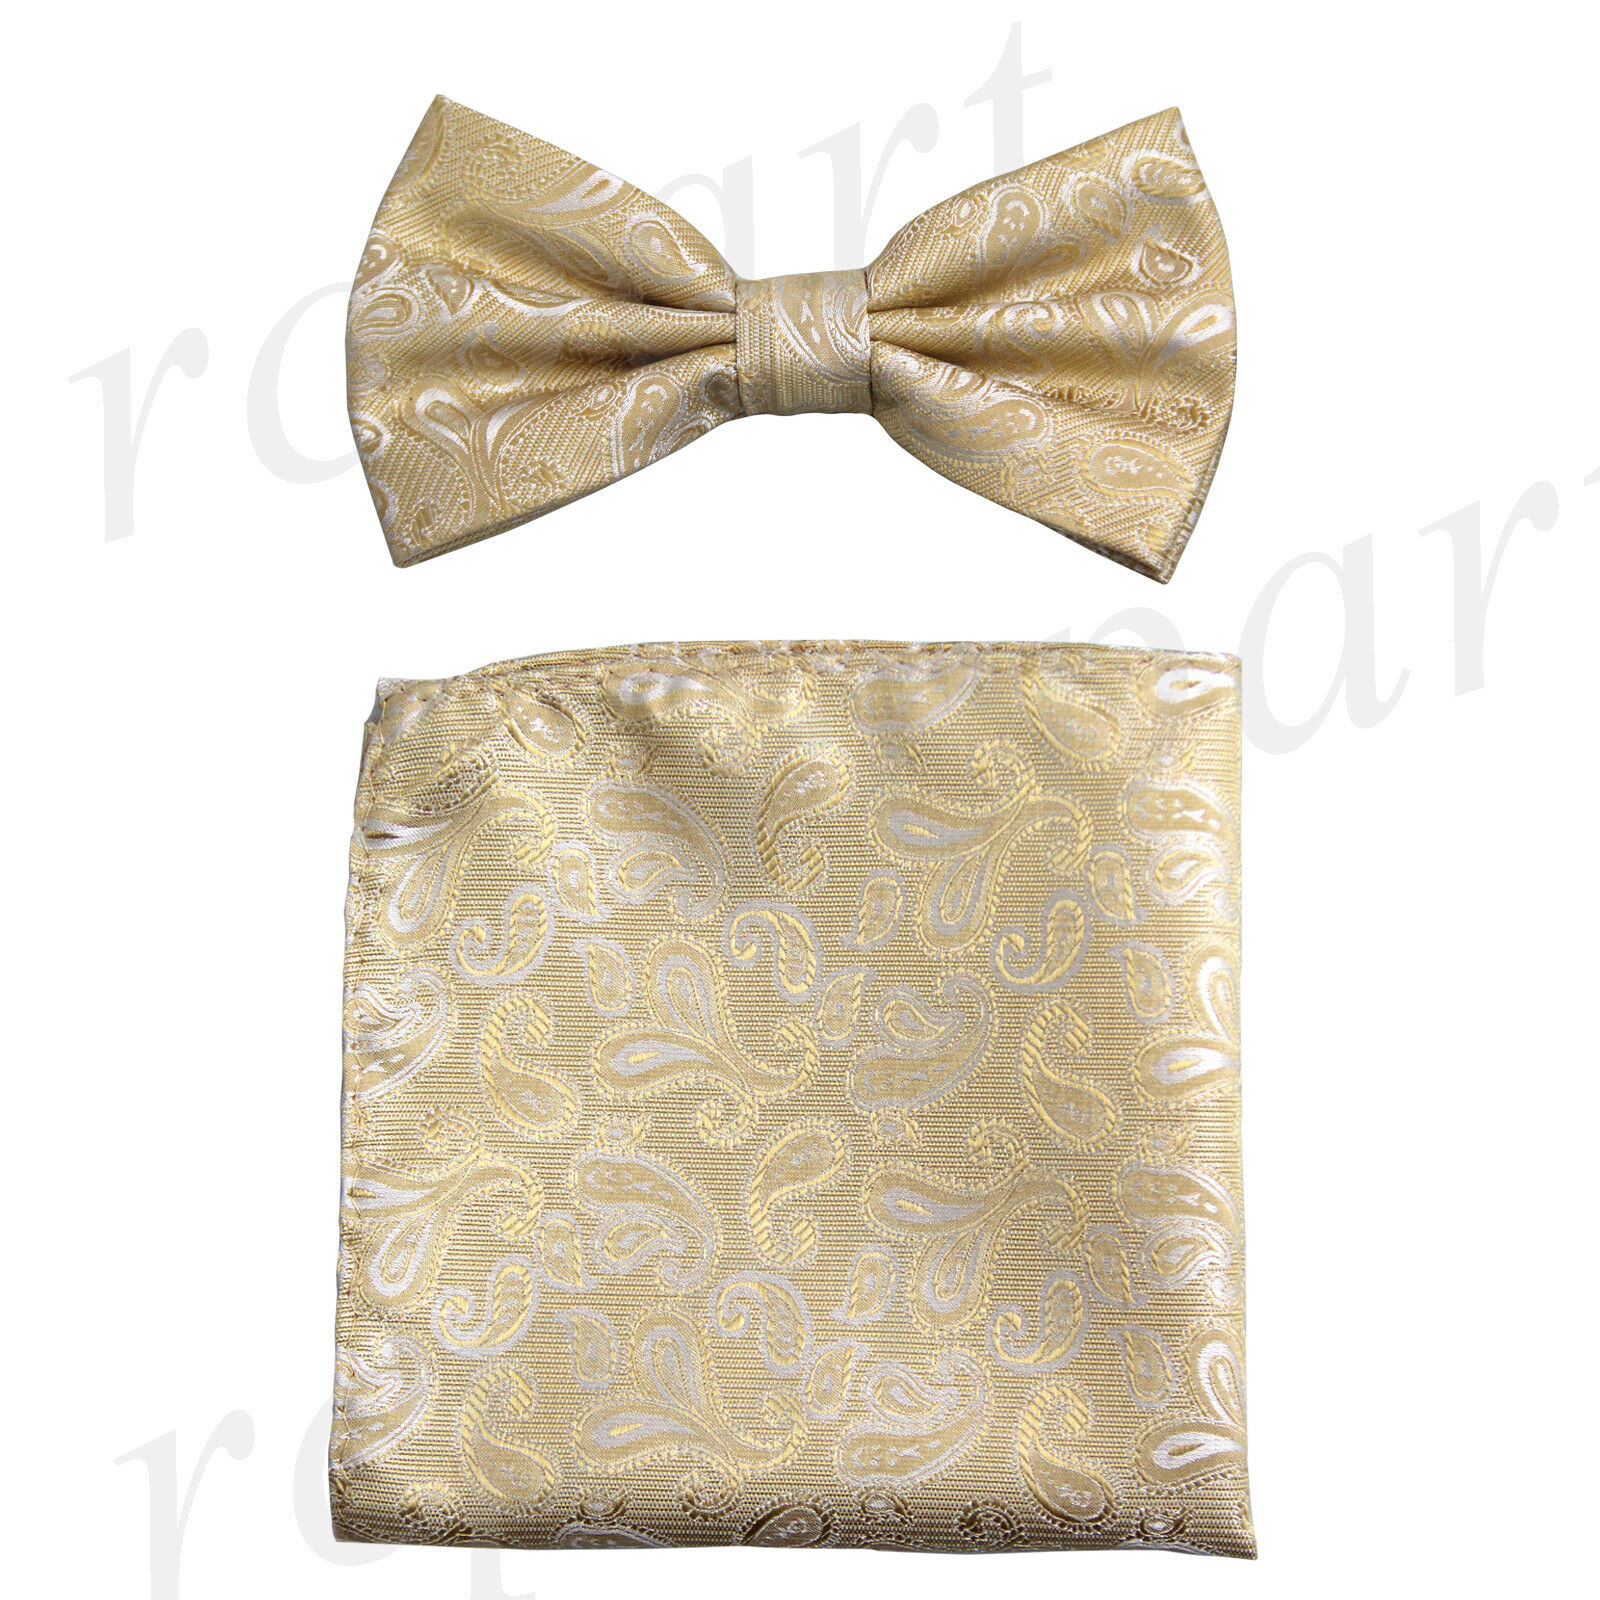 New Brand Q formal Men's Pre-tied Bow Tie & Hankie beige paisley wedding